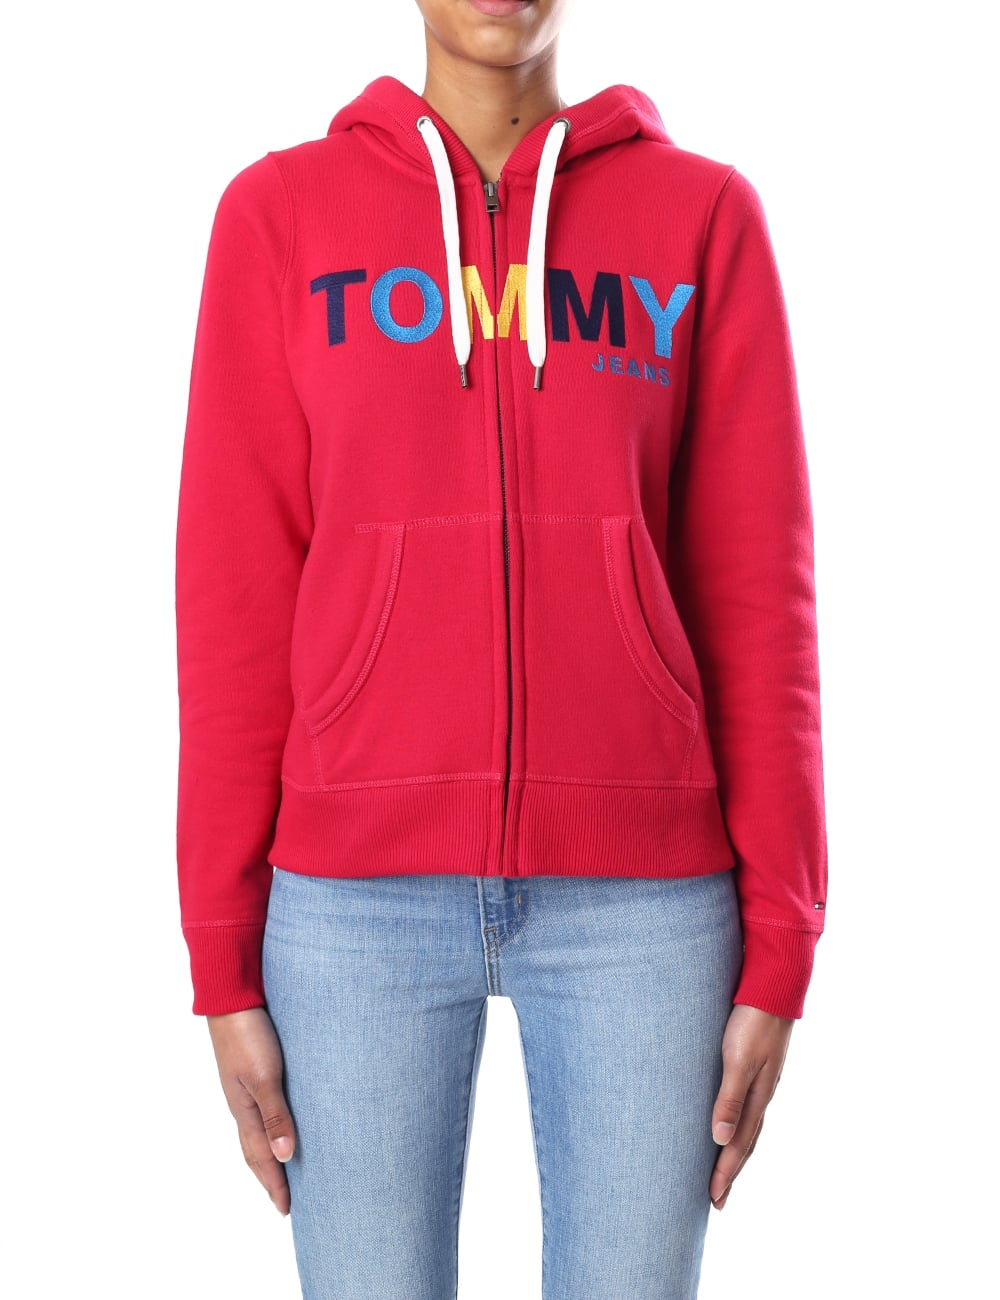 Tommy Hilfiger Logo Women s Zip Through Hooded Sweat Top 972fa1f9c8